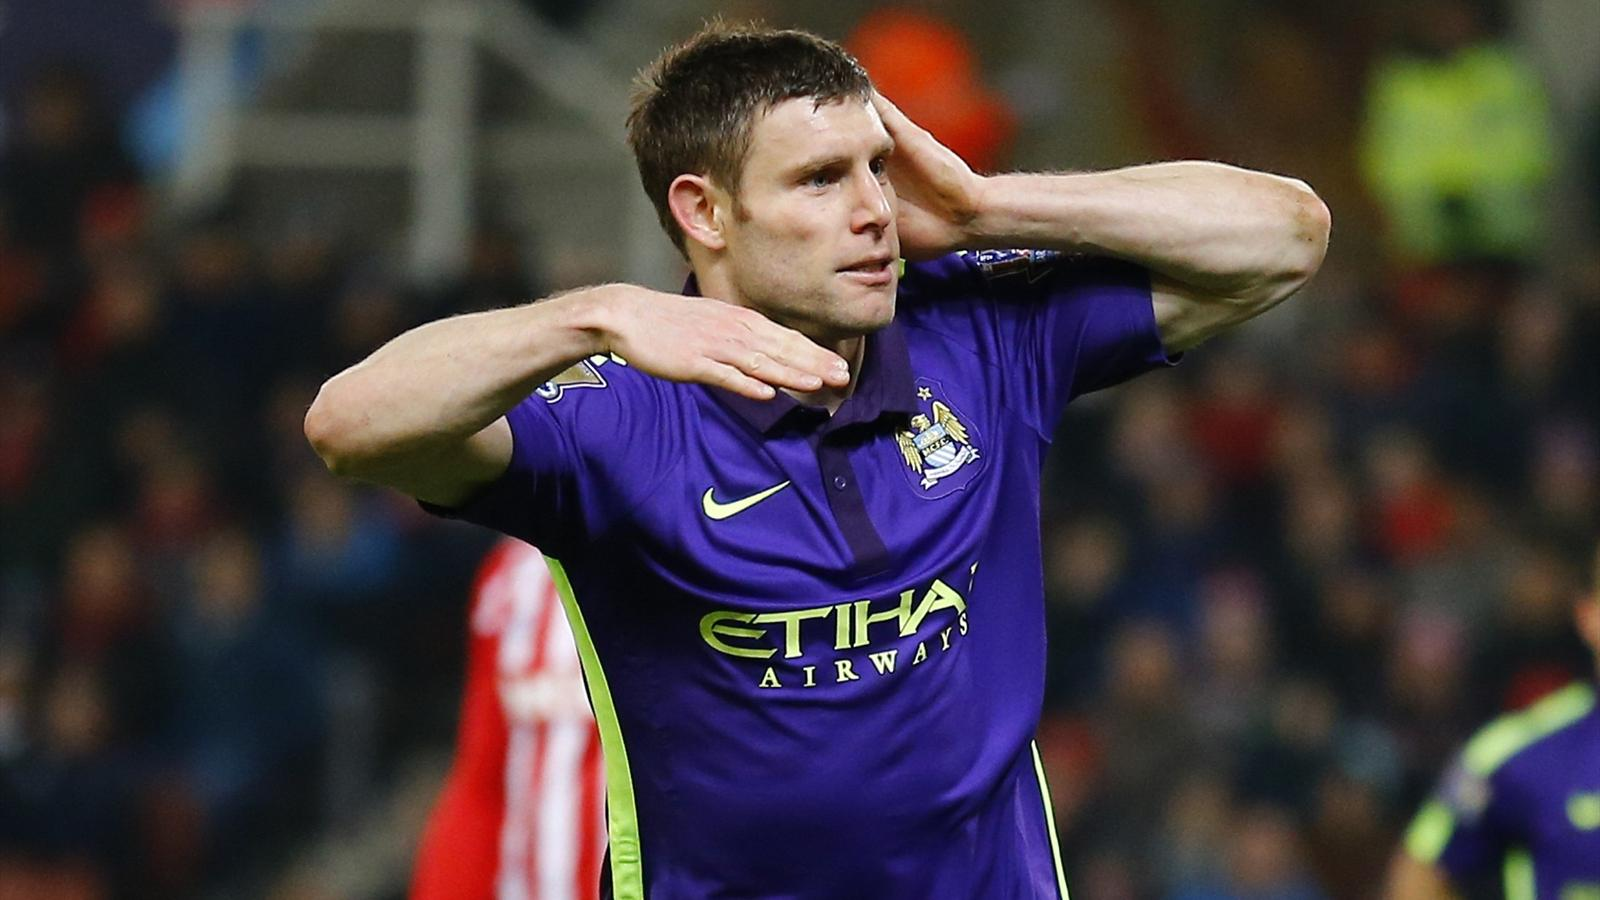 Manchester City's James Milner celebrates scoring against Stoke City